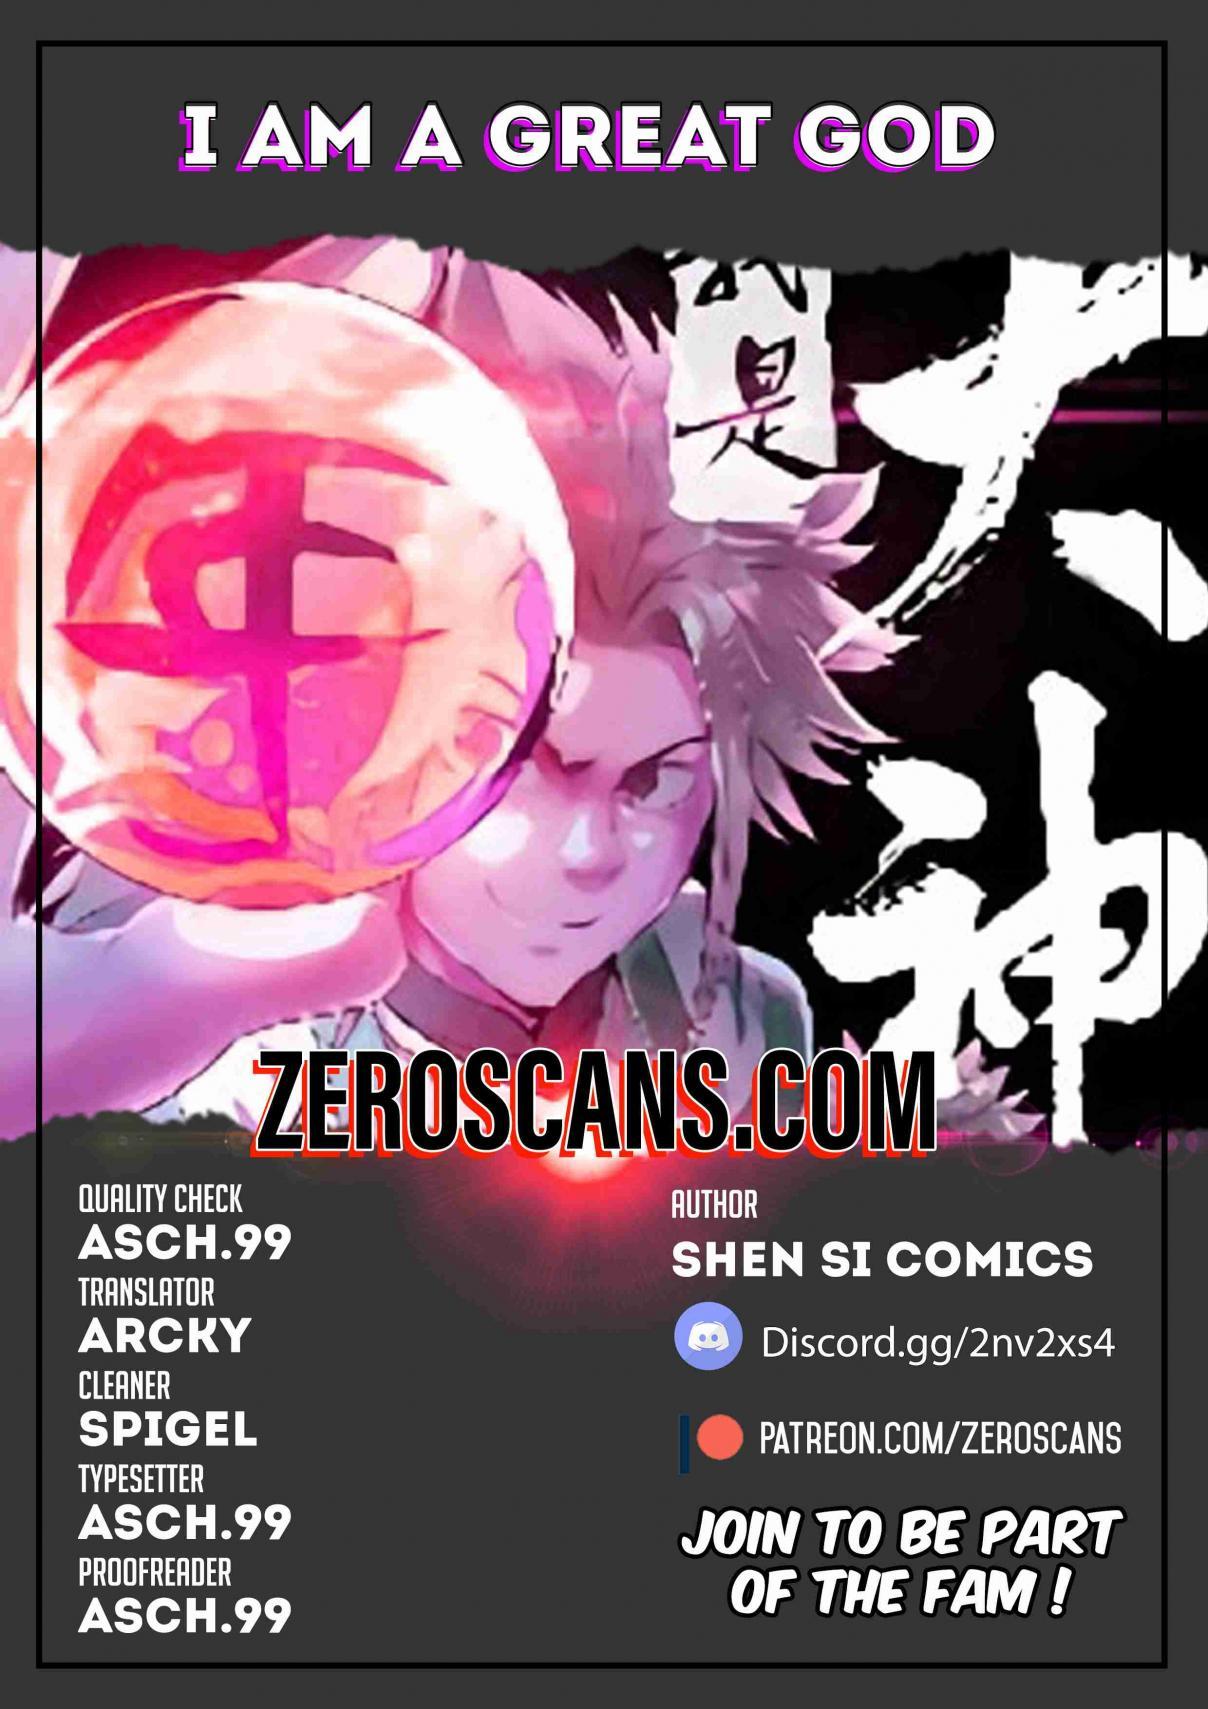 https://im.nineanime.com/comics/pic9/4/21124/512603/5bf73bc6c6e6775d472621264309a88b.jpg Page 1